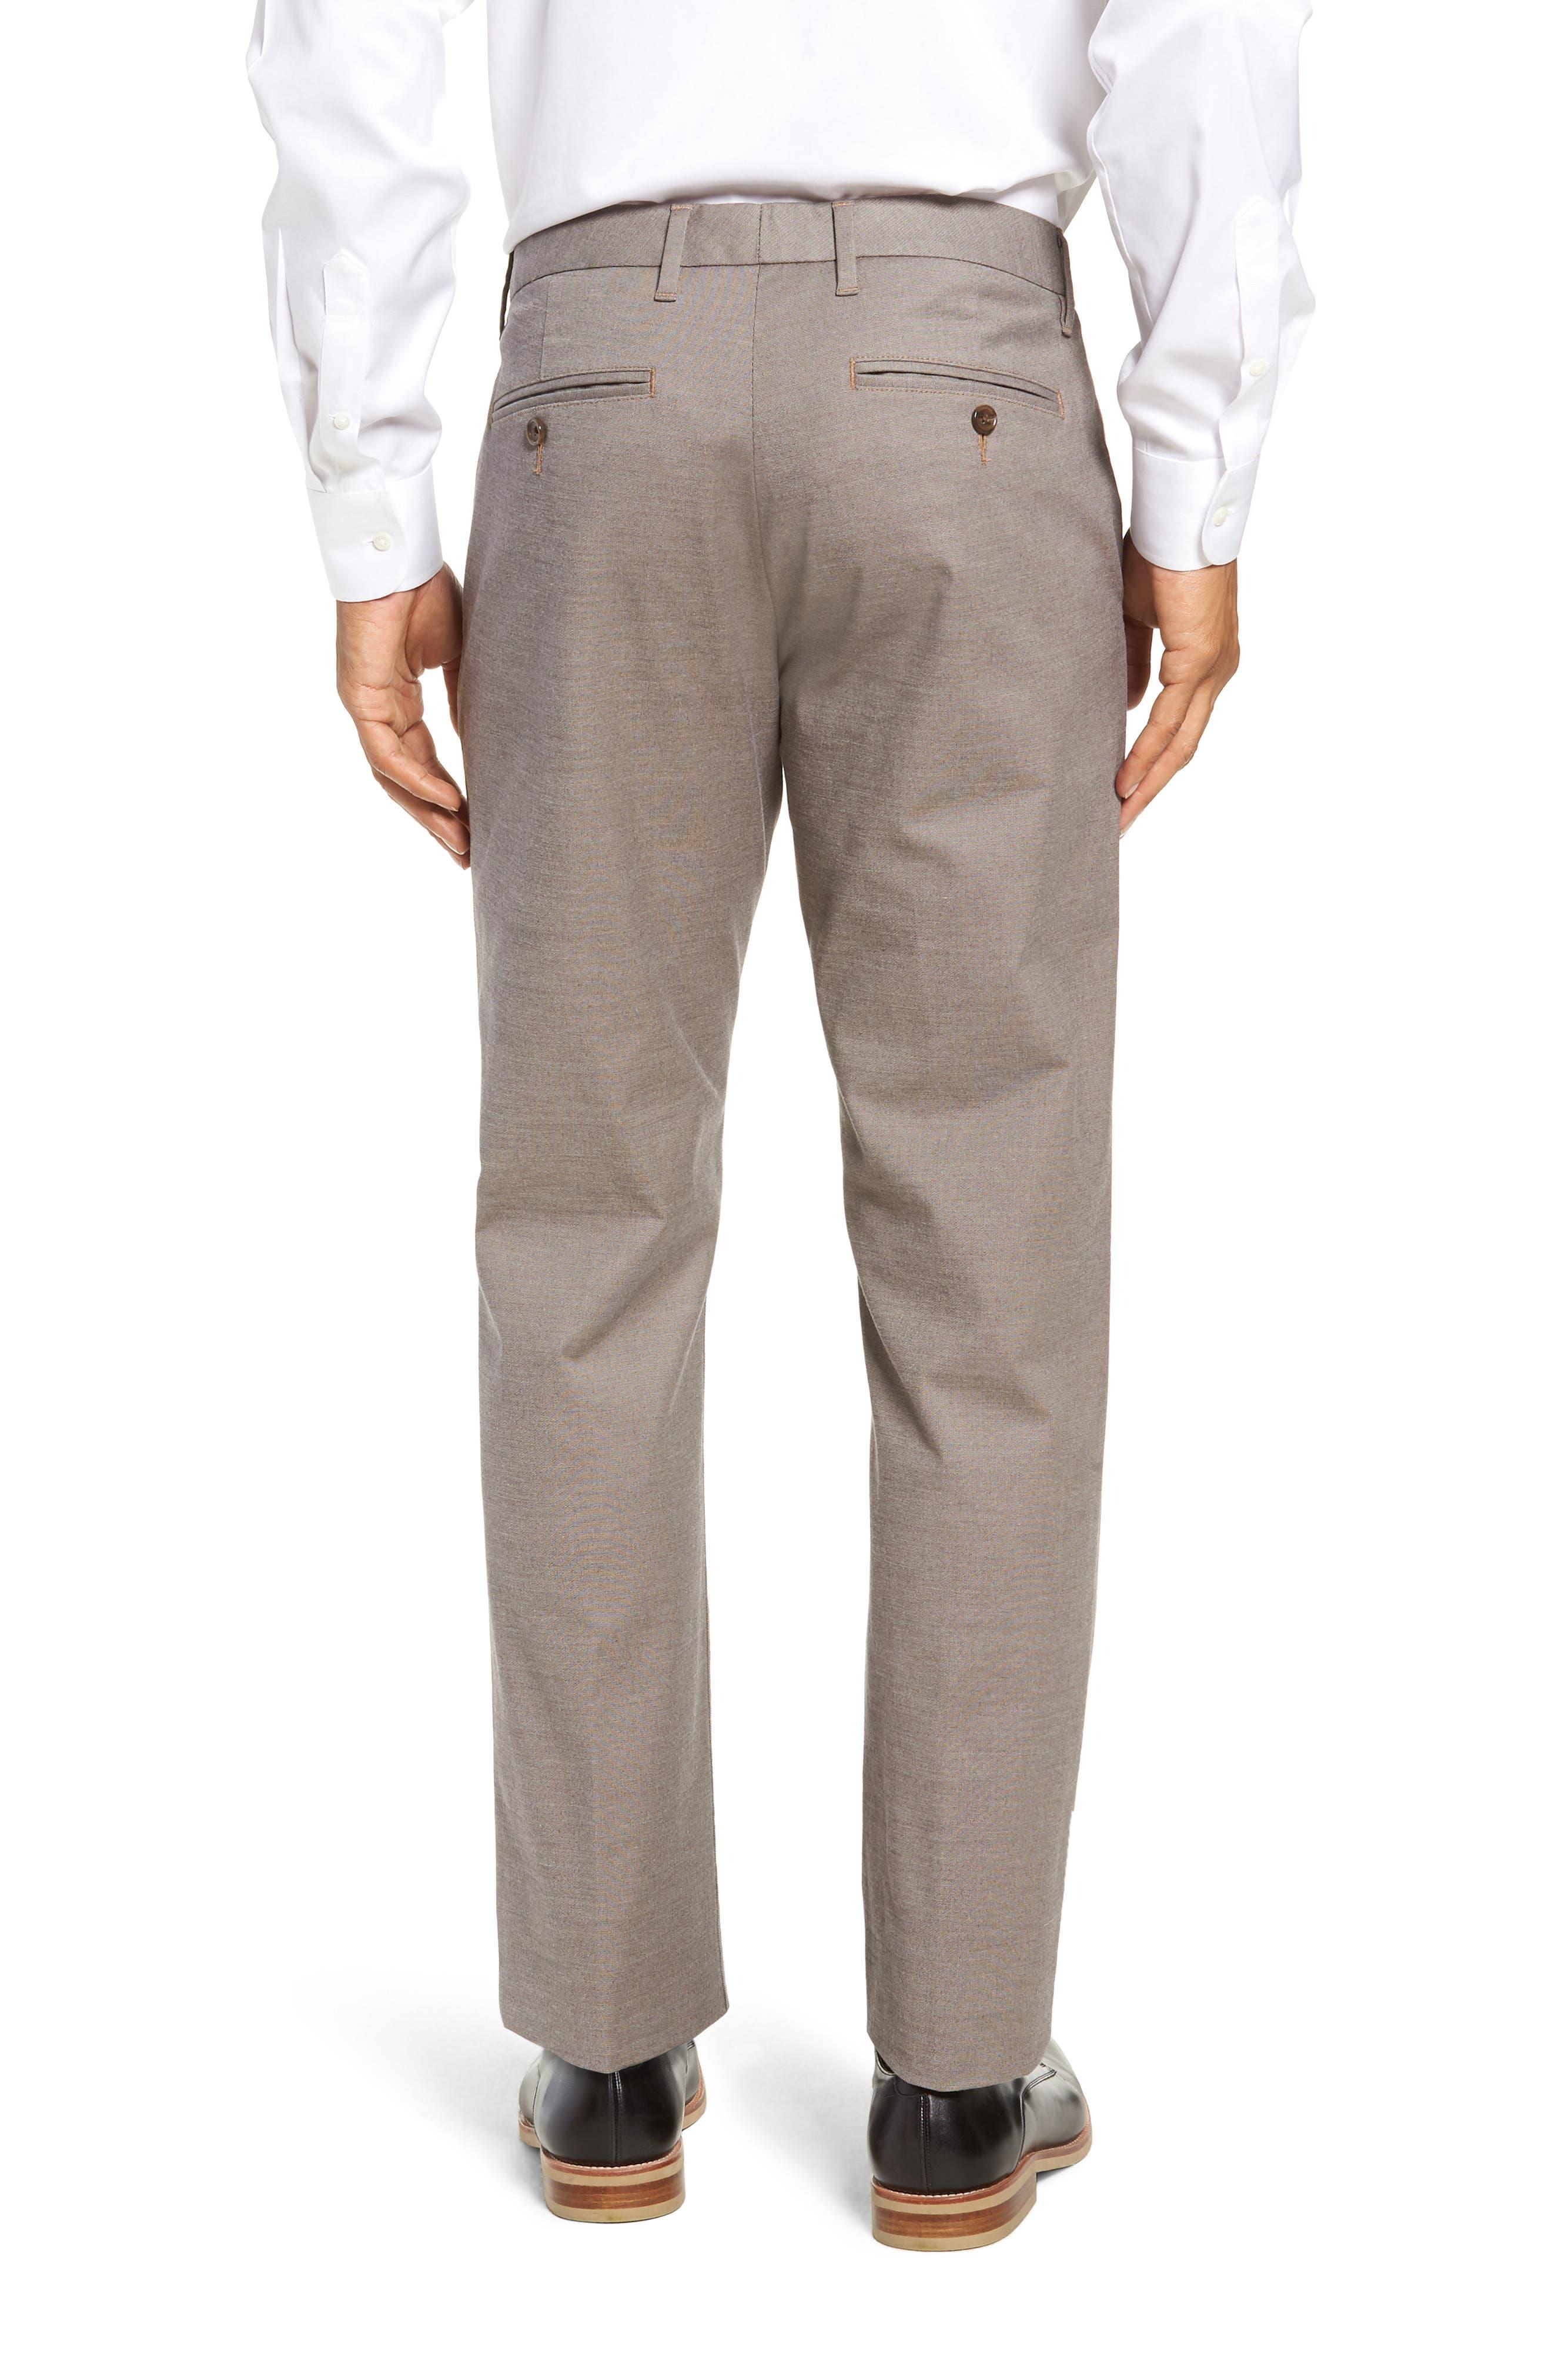 BONOBOS, Weekday Warrior Slim Fit Stretch Dress Pants, Alternate thumbnail 2, color, LIGHT KHAKI YARN DYE